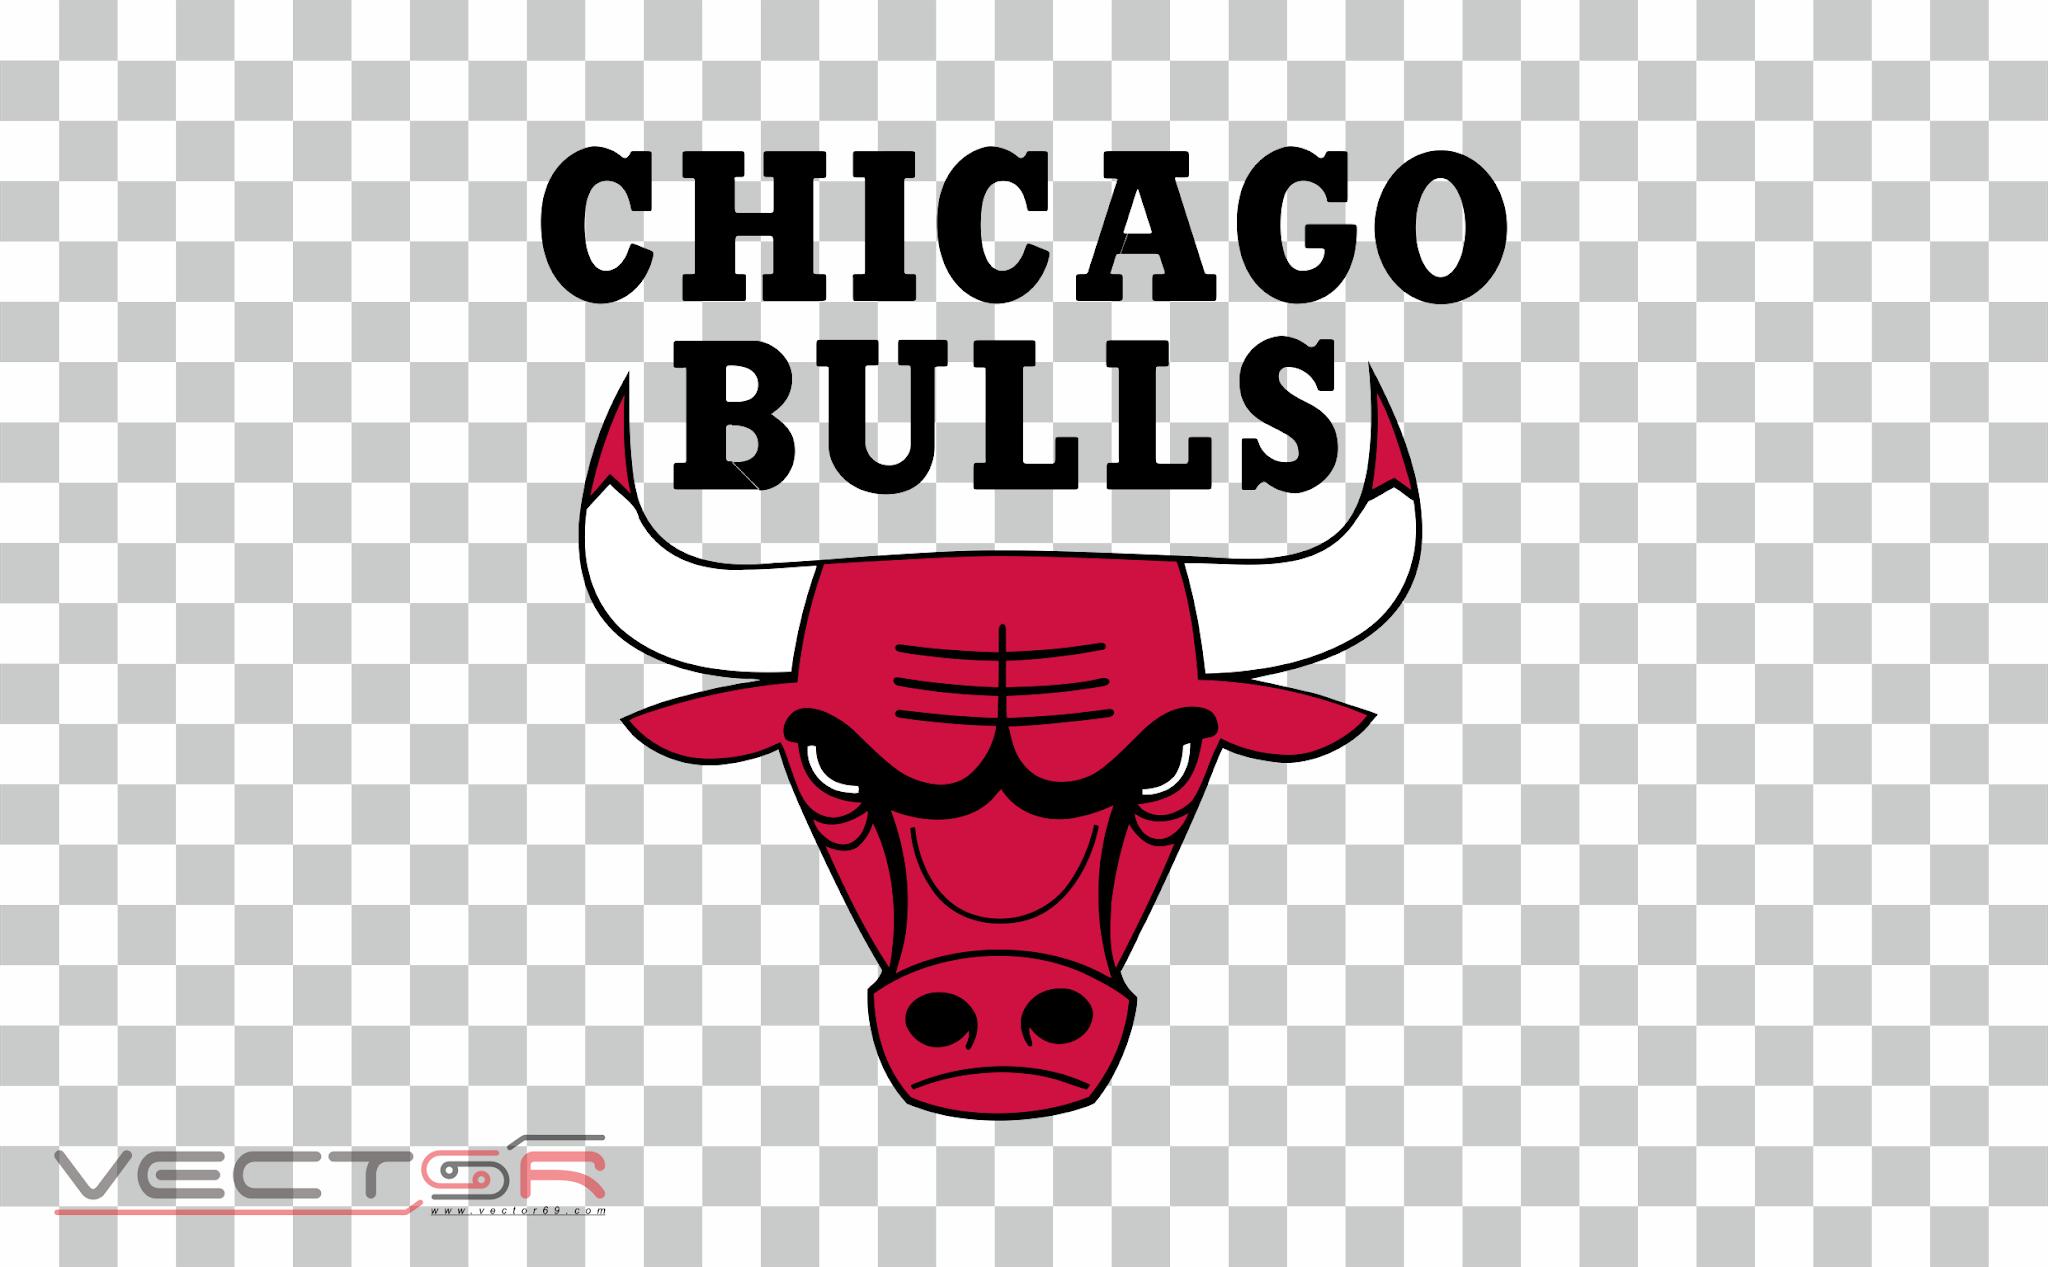 Chicago Bulls Logo - Download .PNG (Portable Network Graphics) Transparent Images